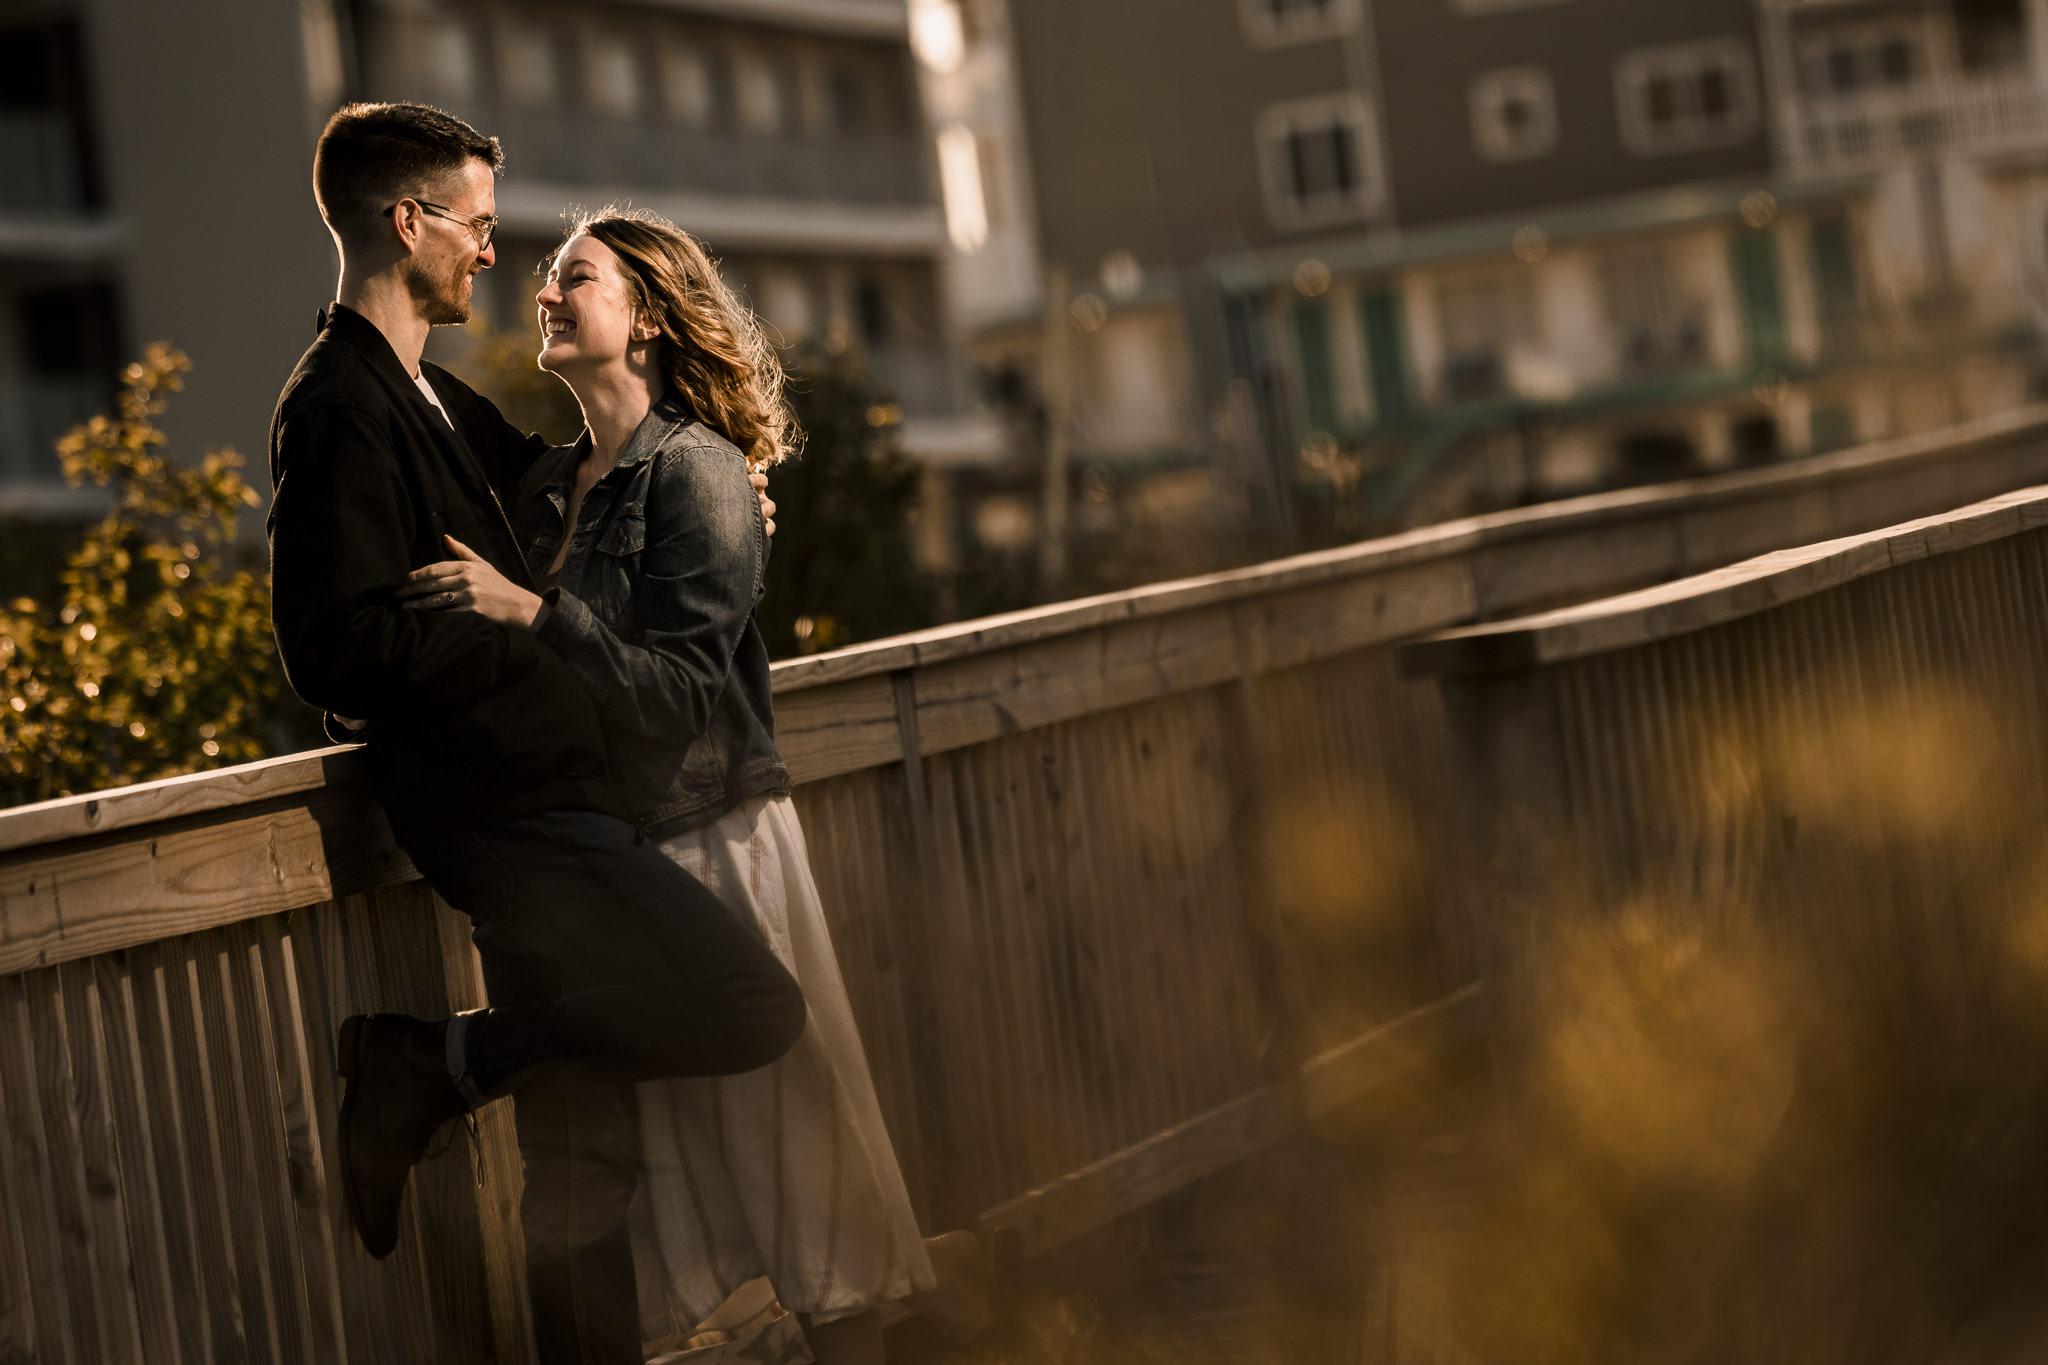 Robbins-Wildwood-Cape-May-Engagement-Photos-NJ-Photographer-04.JPG